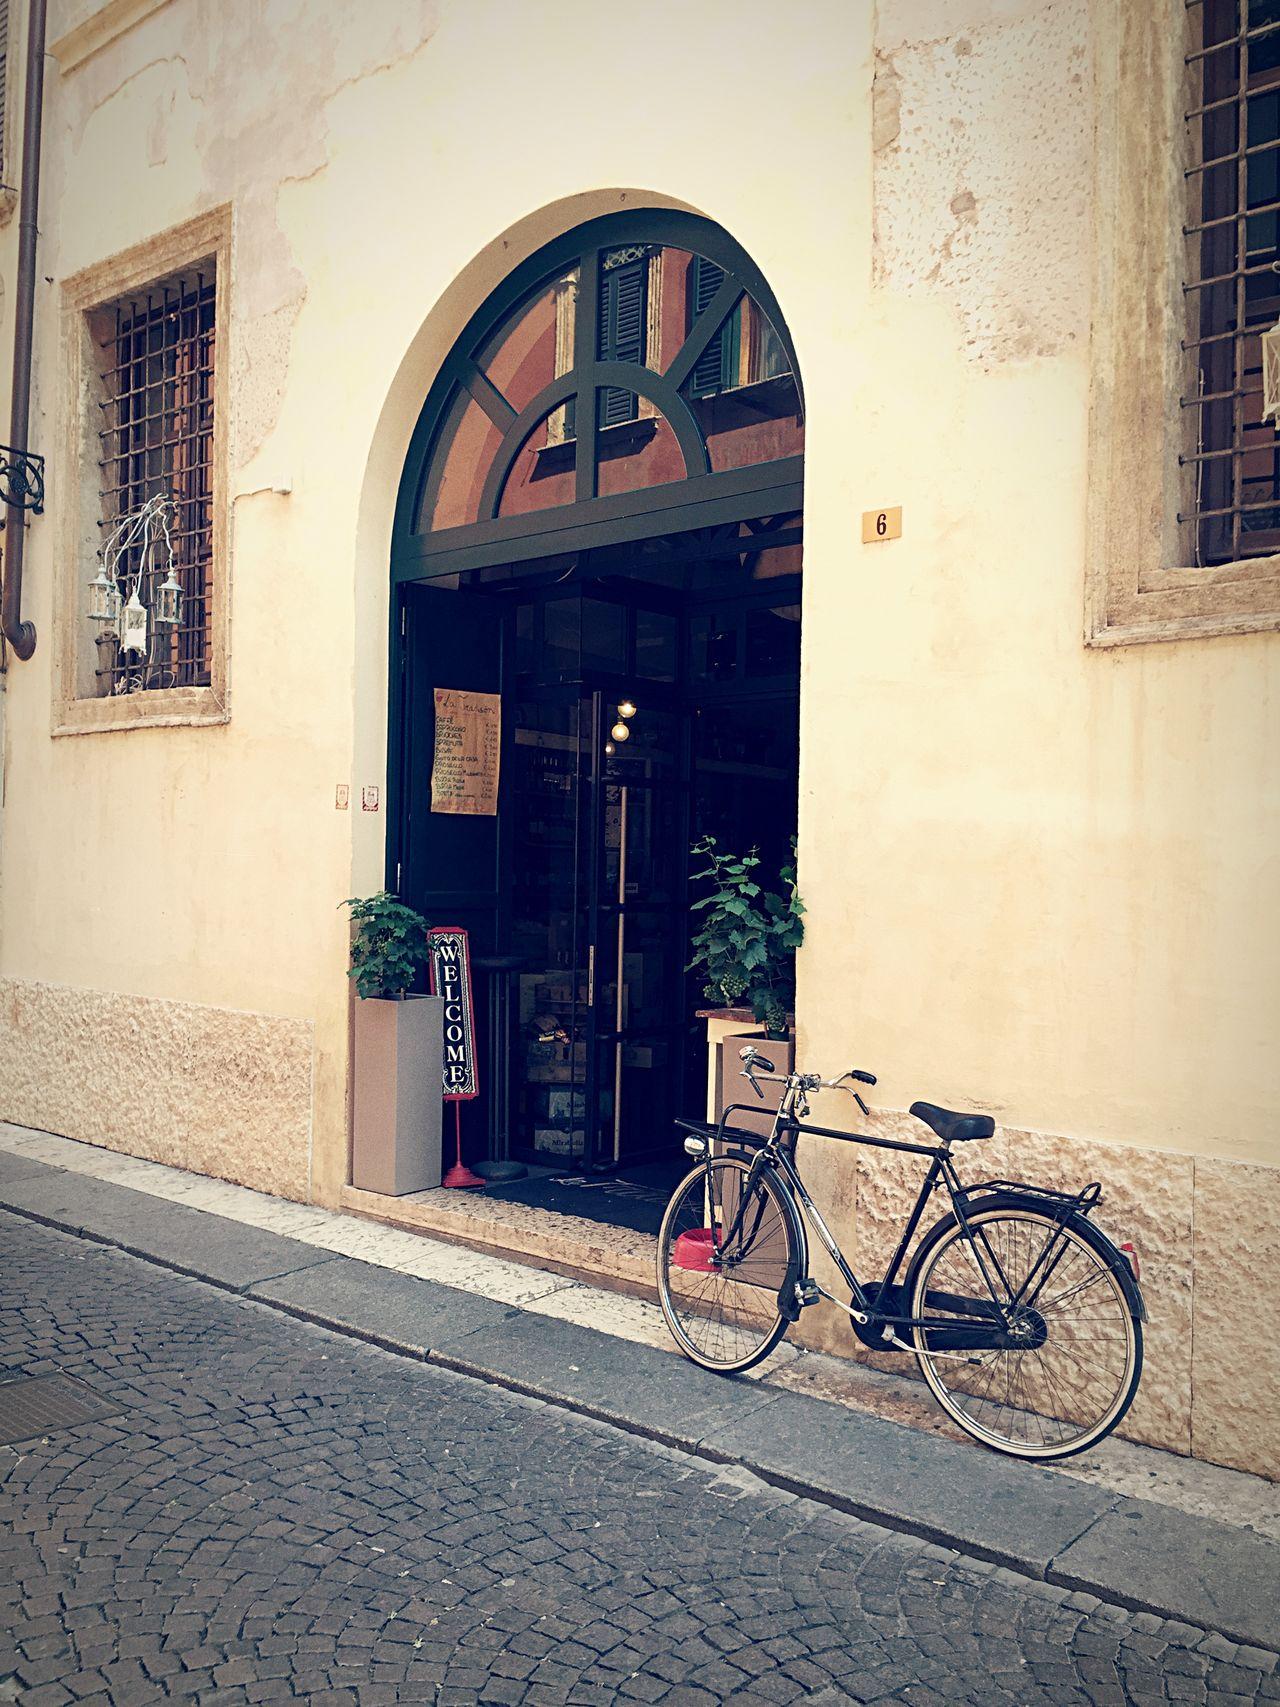 La Tradision Bar Verona Italy Italy❤️ Italia Bicycle Streetphotography Street Photography Bike